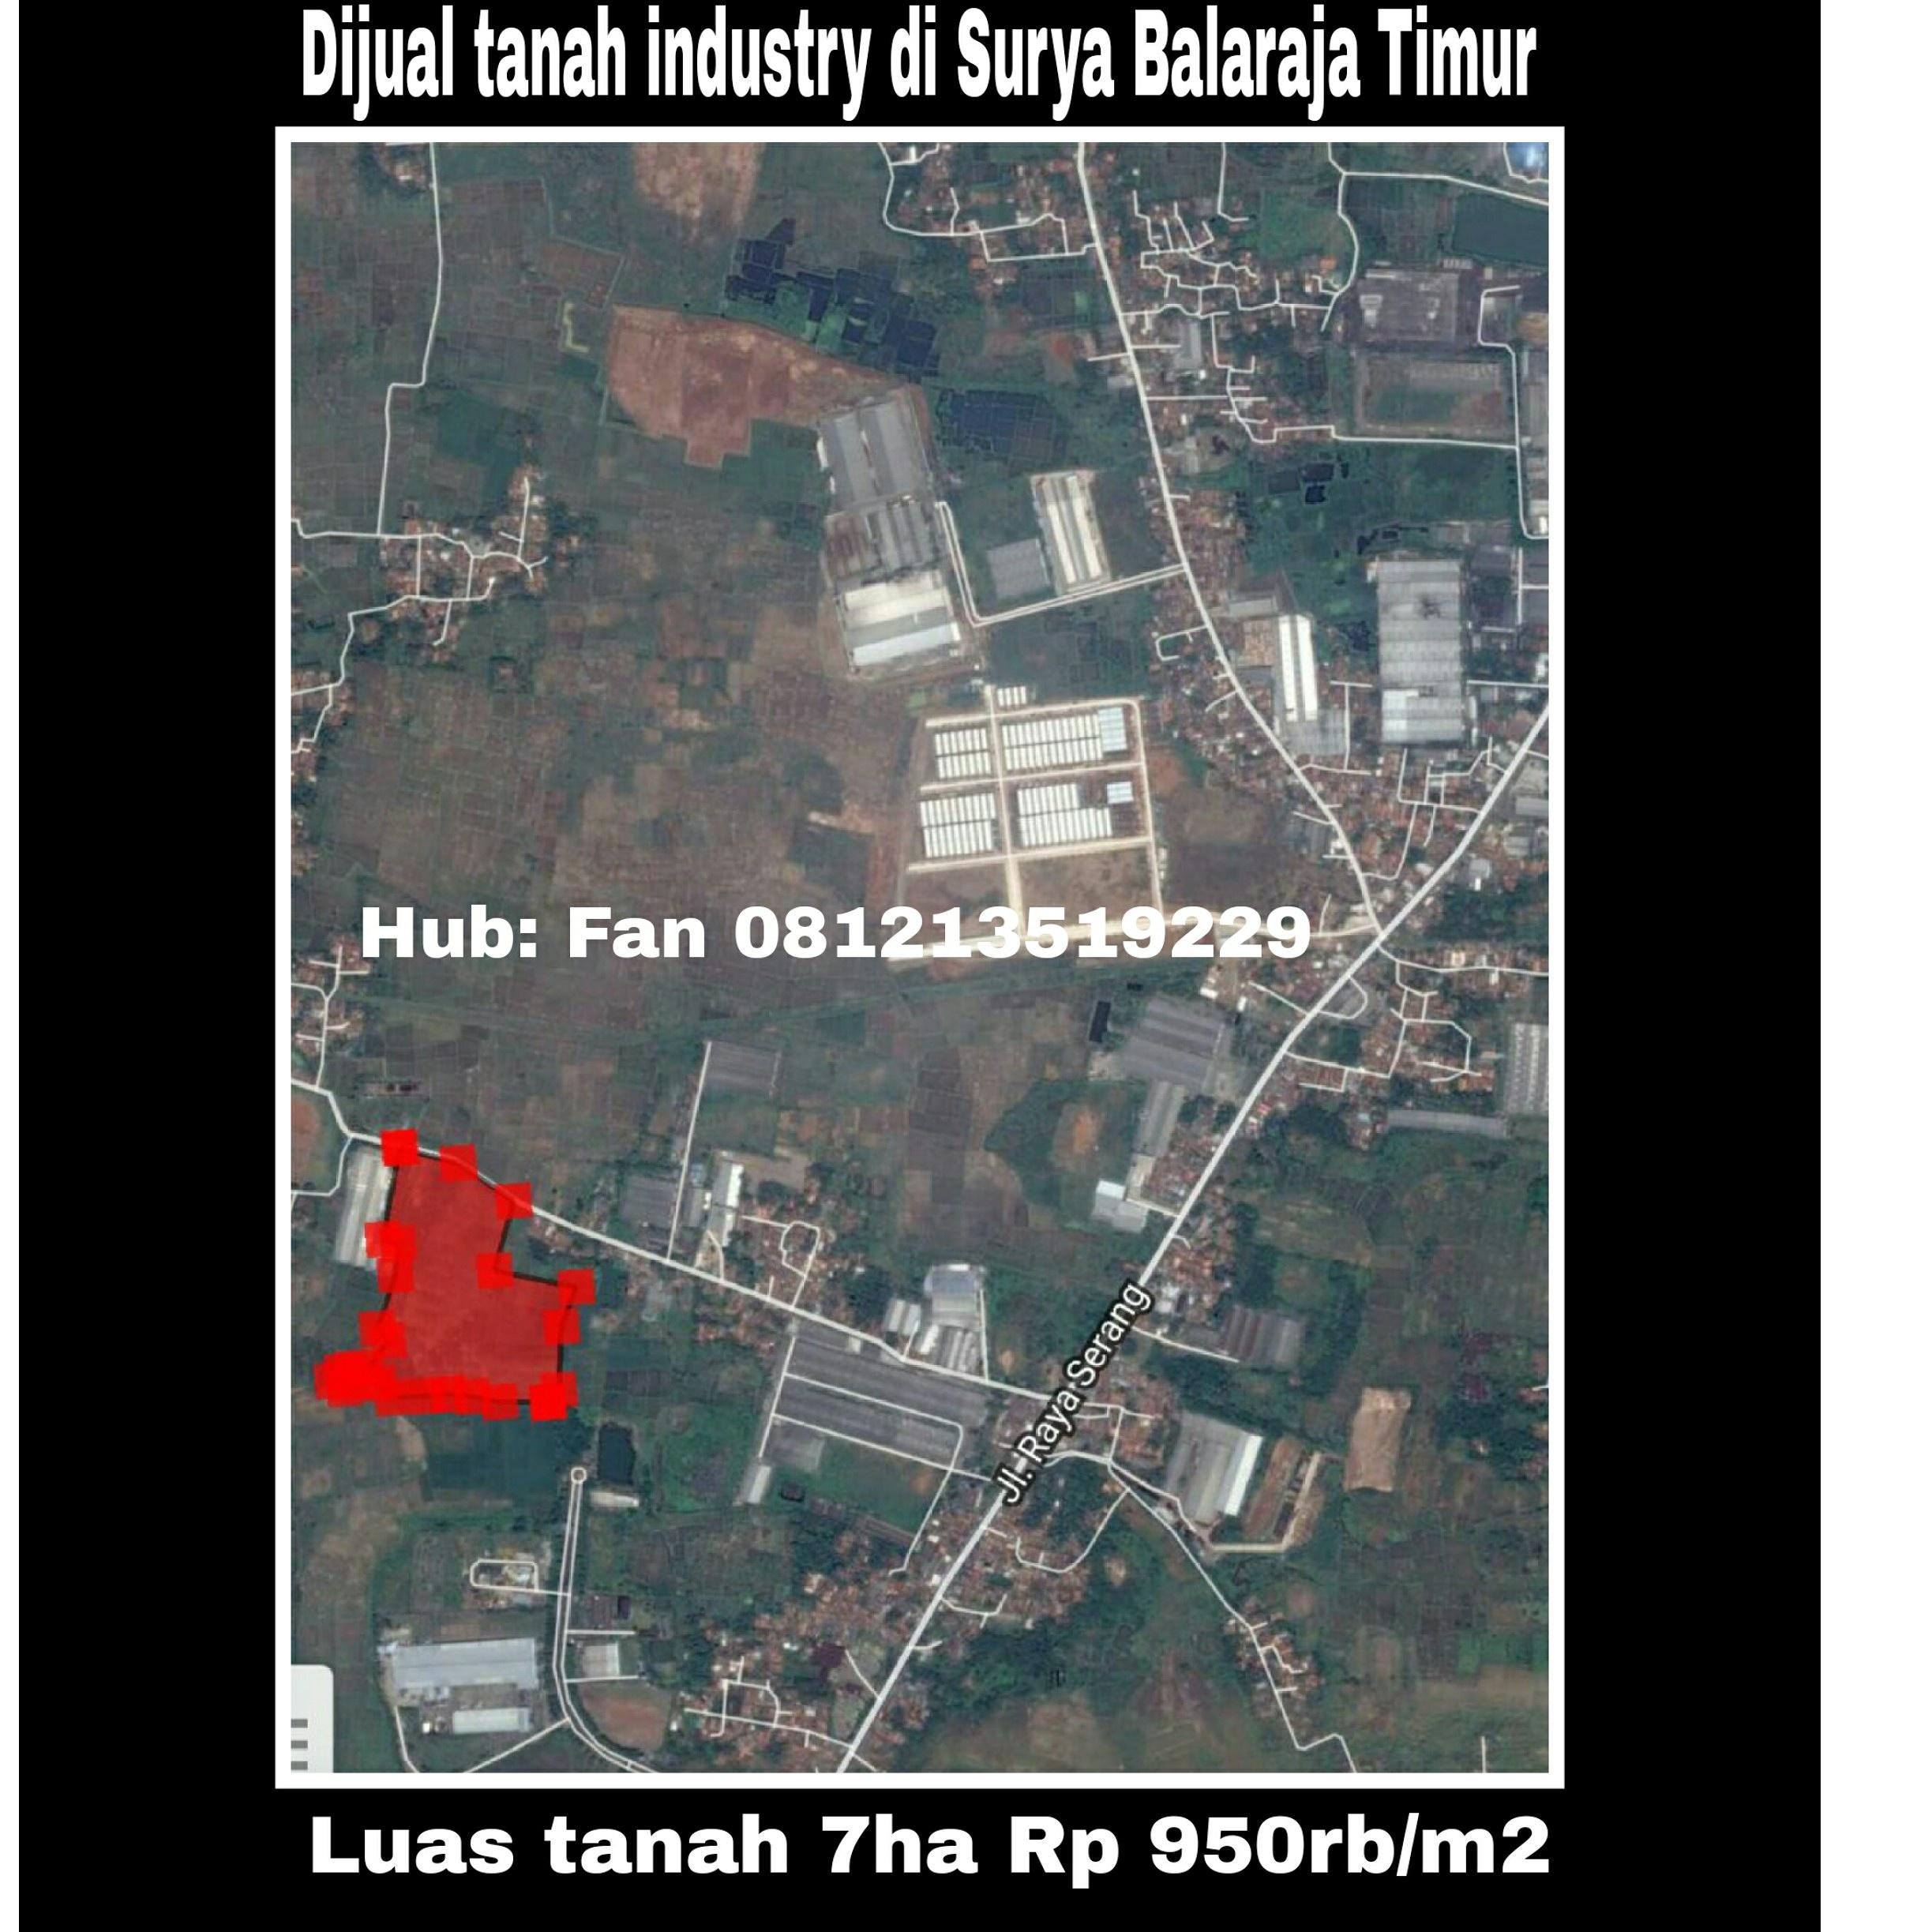 Kavling Industry Surya Balaraja.jpg